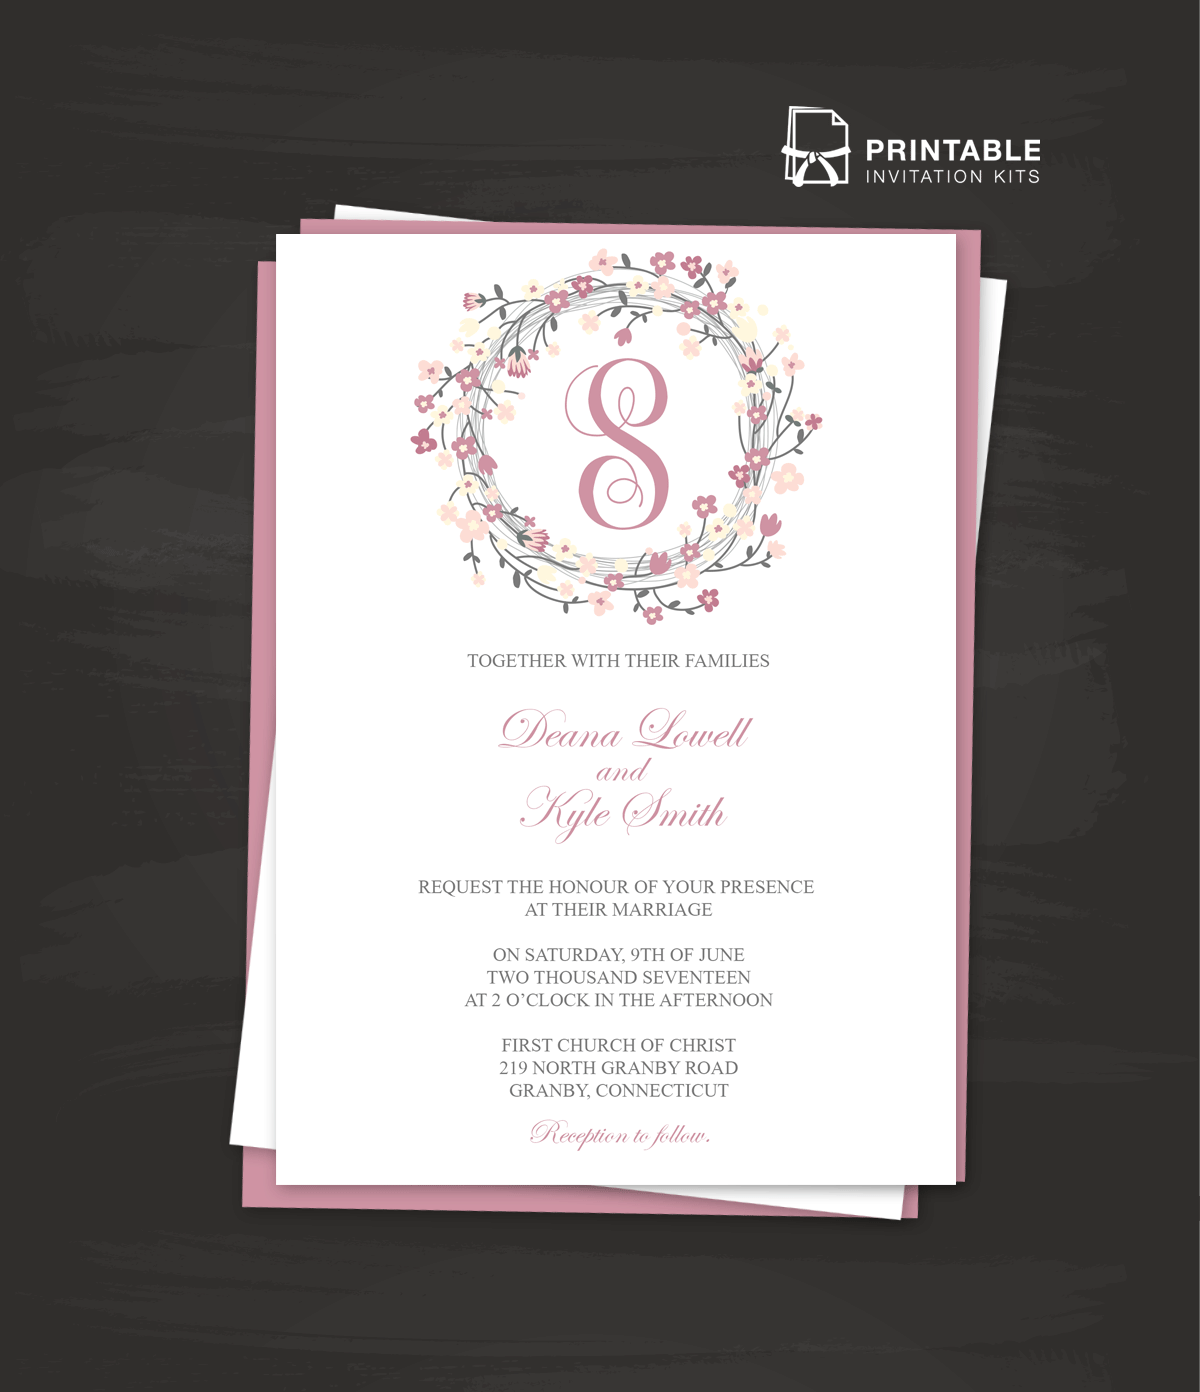 Downloadable Wedding Invitation Templates: Floral Wreath Logo Invitation Template ← Wedding